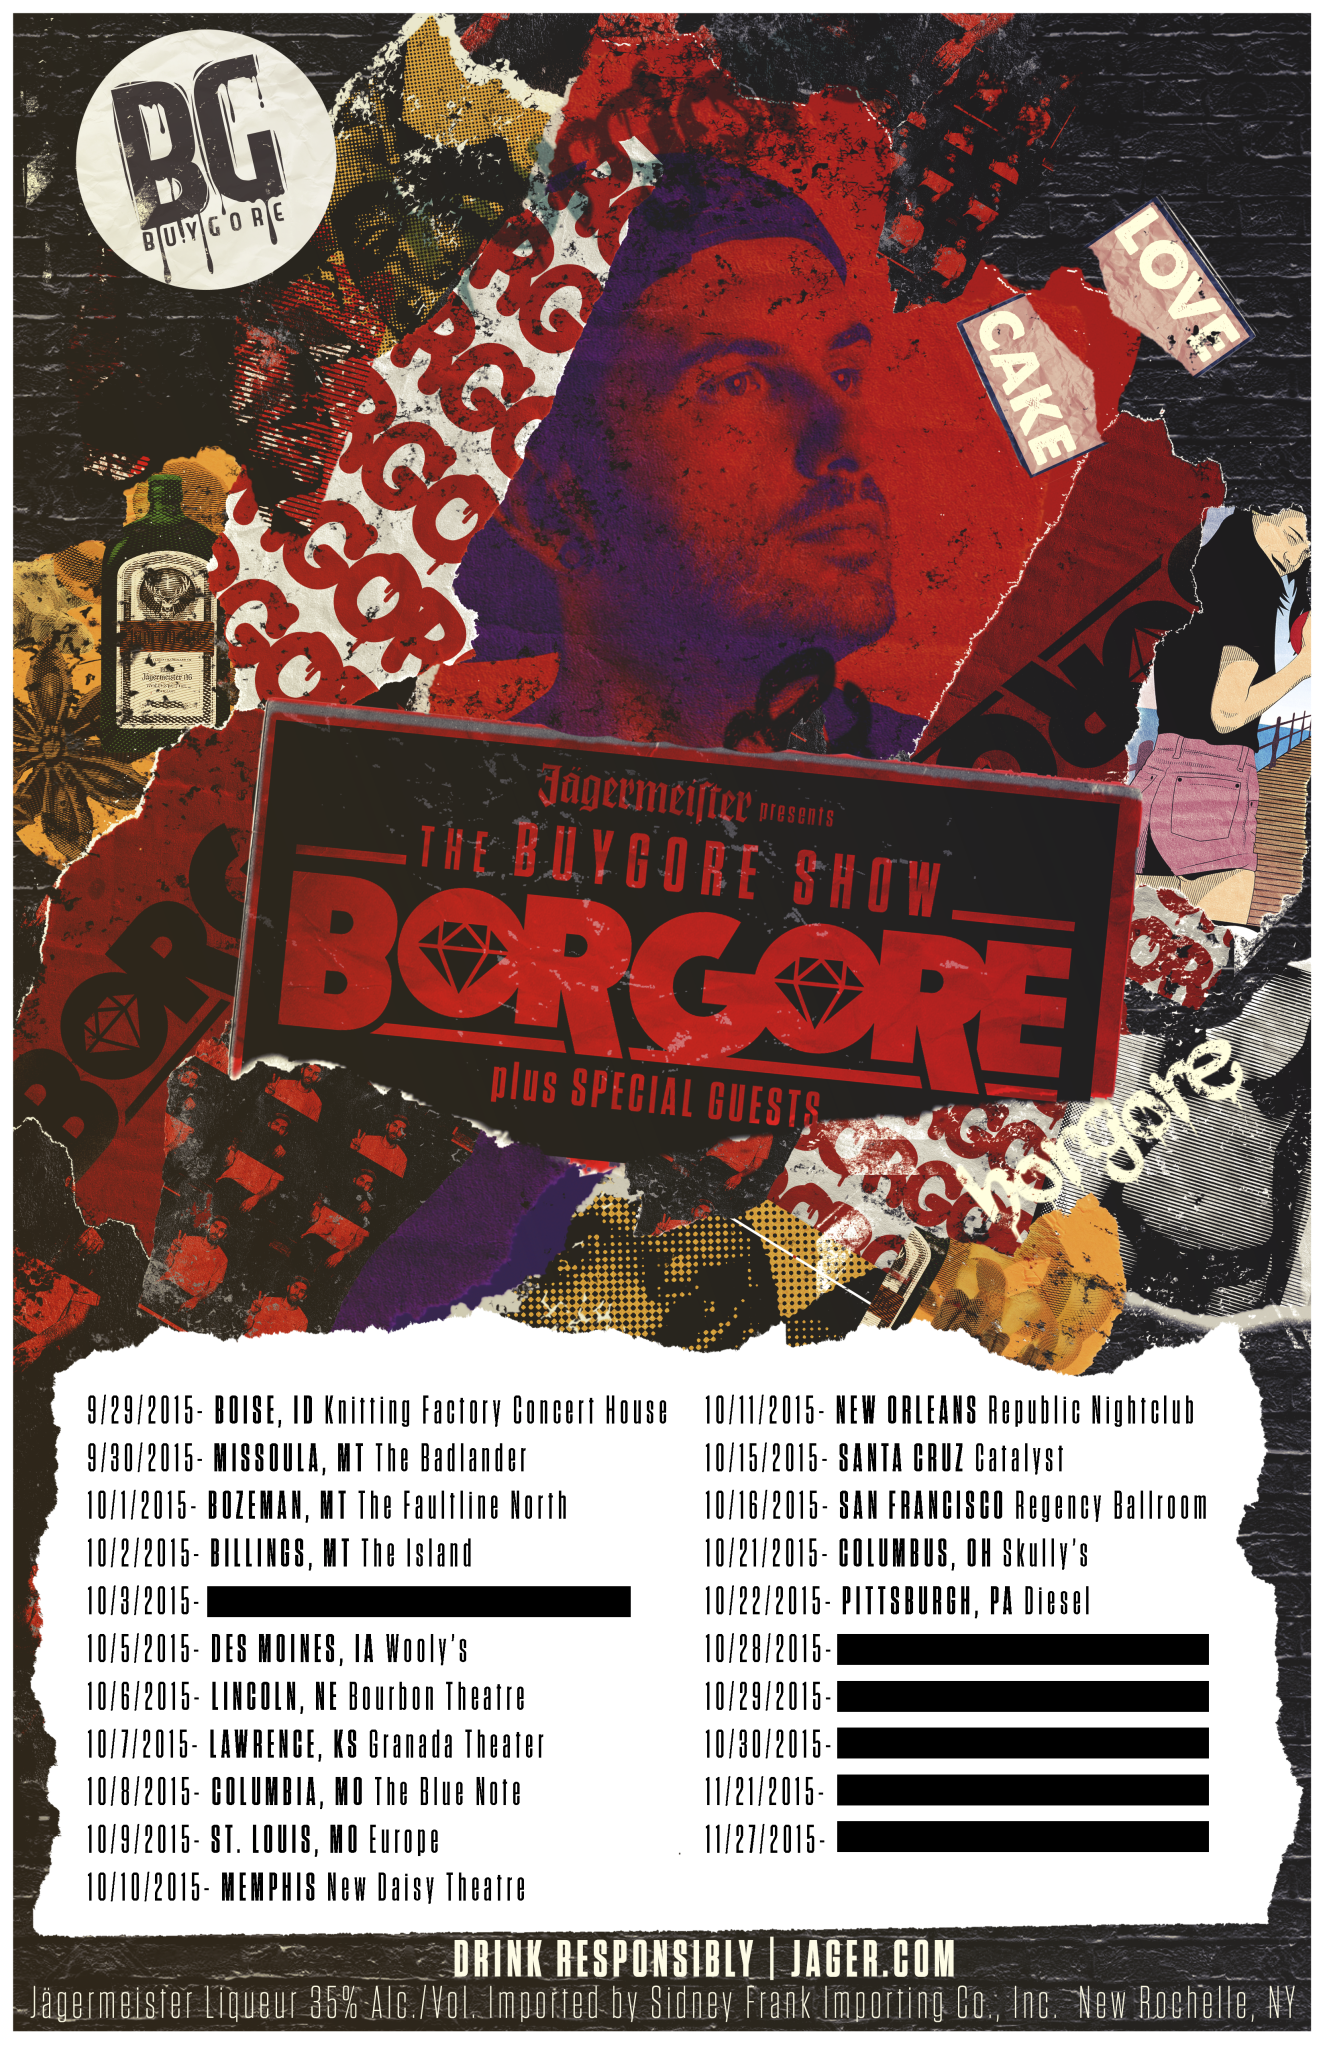 buygore show tour